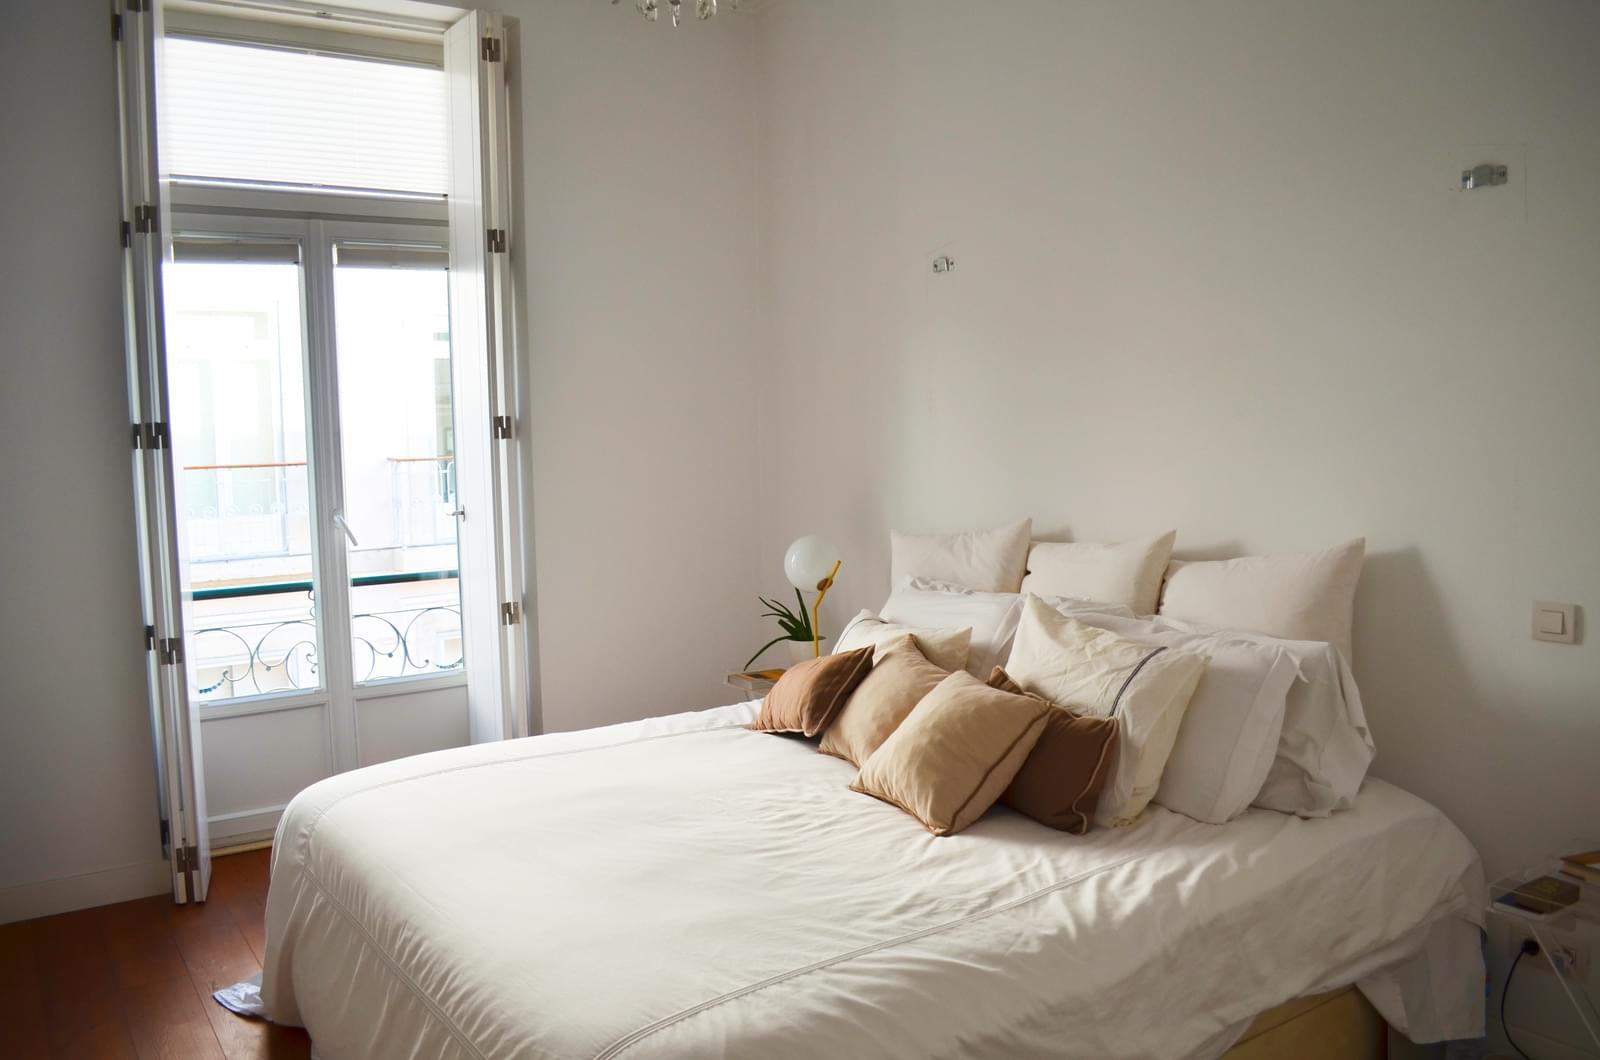 pf18712-apartamento-t2-lisboa-bea71701-7fd6-468a-8e58-4cf676d74bff